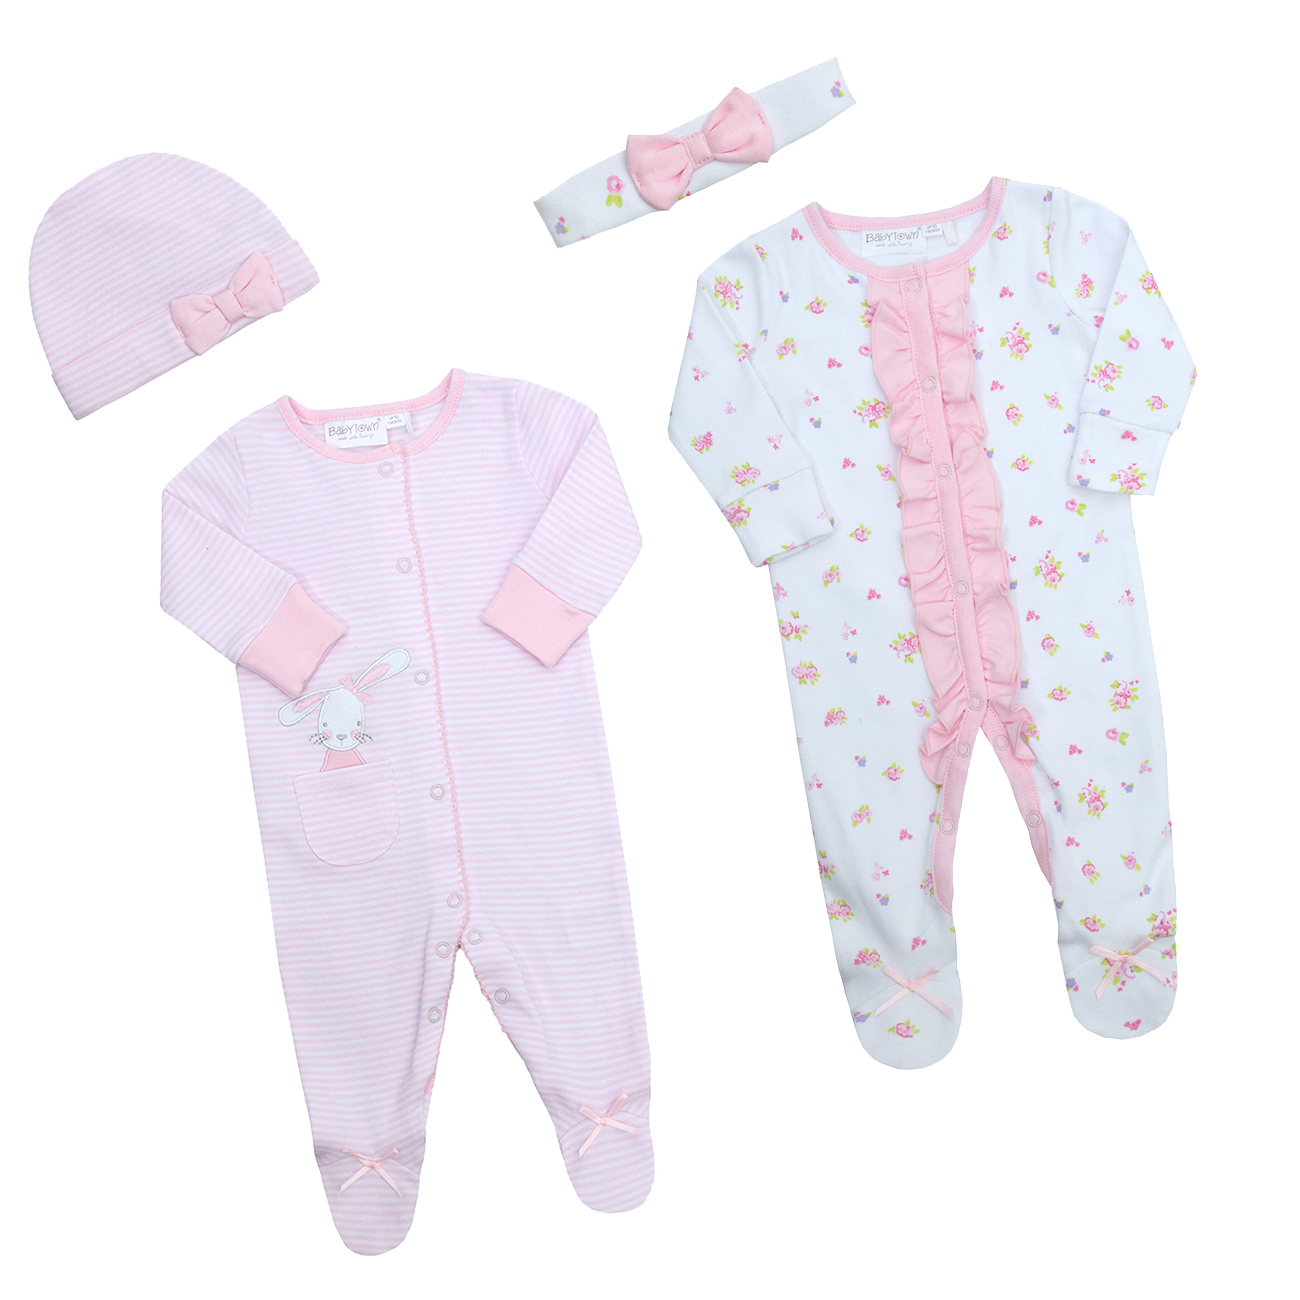 Newborn Infant Baby Boys Dinosaur Sleepsuit Set Cradle Cute Cap Hat Premature